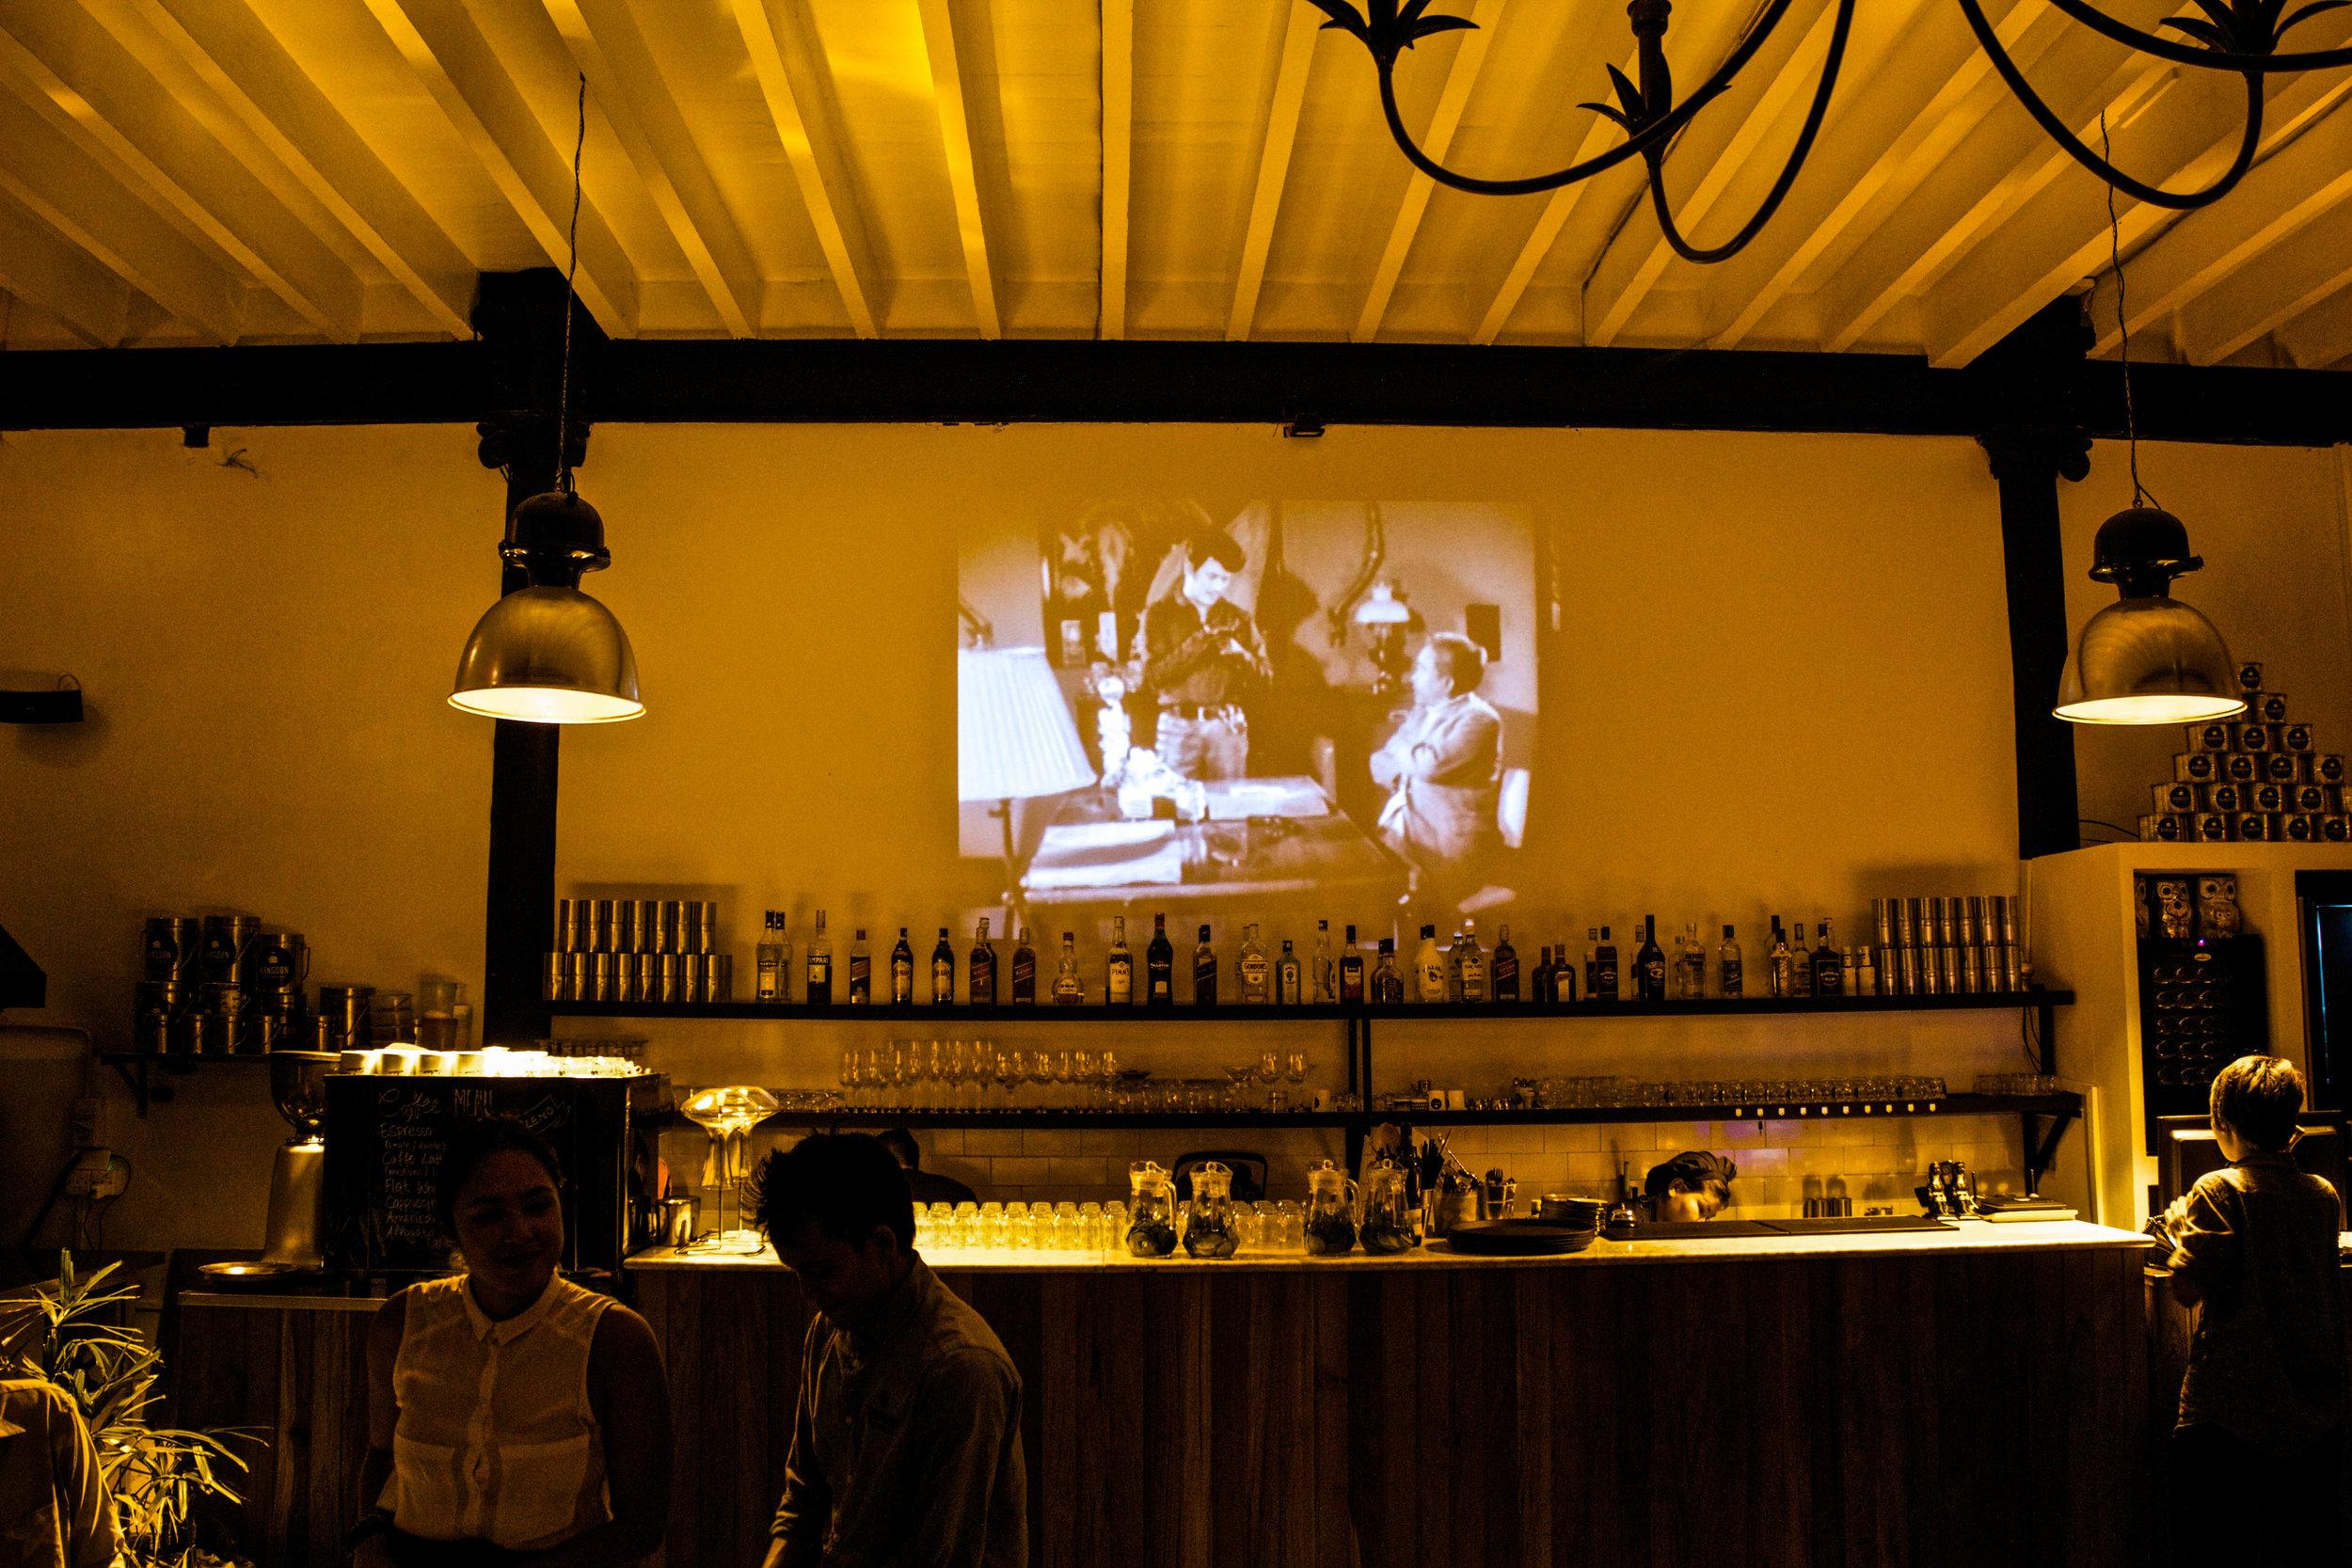 rangoon tea house restaurant yangon burma myanmar 3-2.jpg